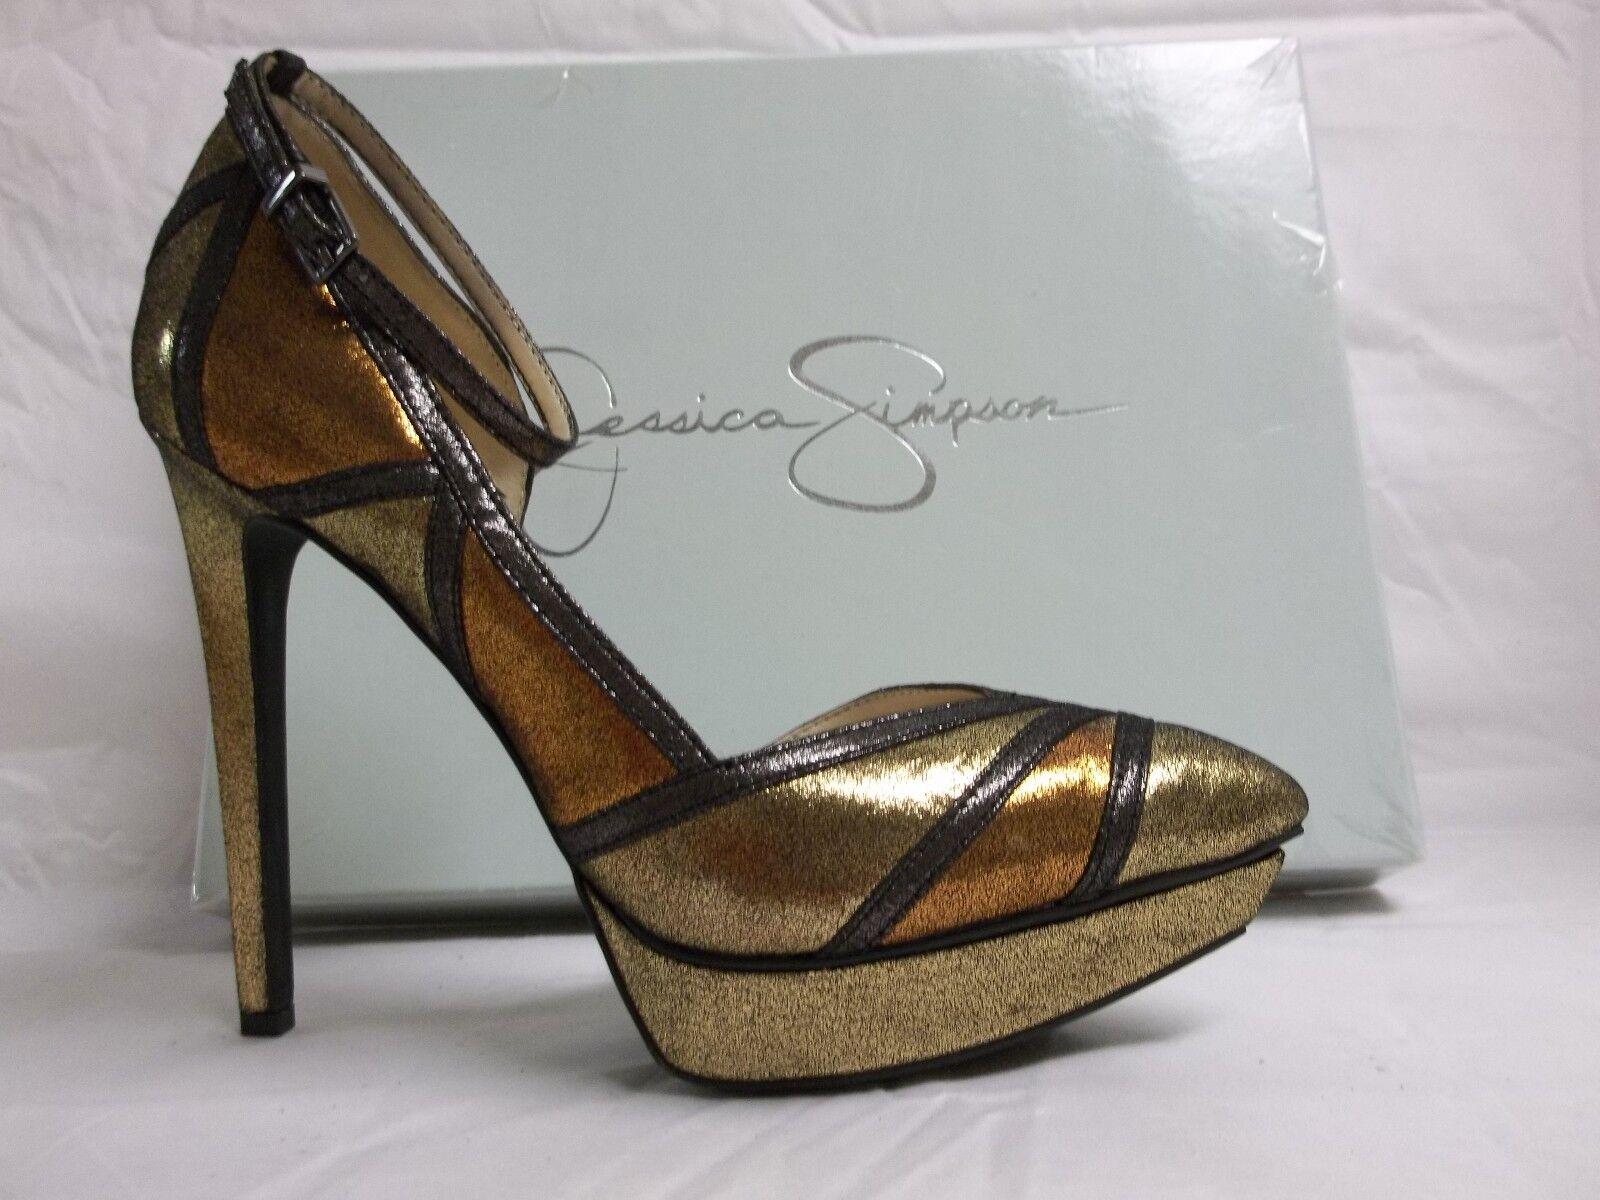 Jessica Simpson Größe 7.5 M Vindie Gold Combo Ankle Strap Heels NEU Damenschuhe Schuhes